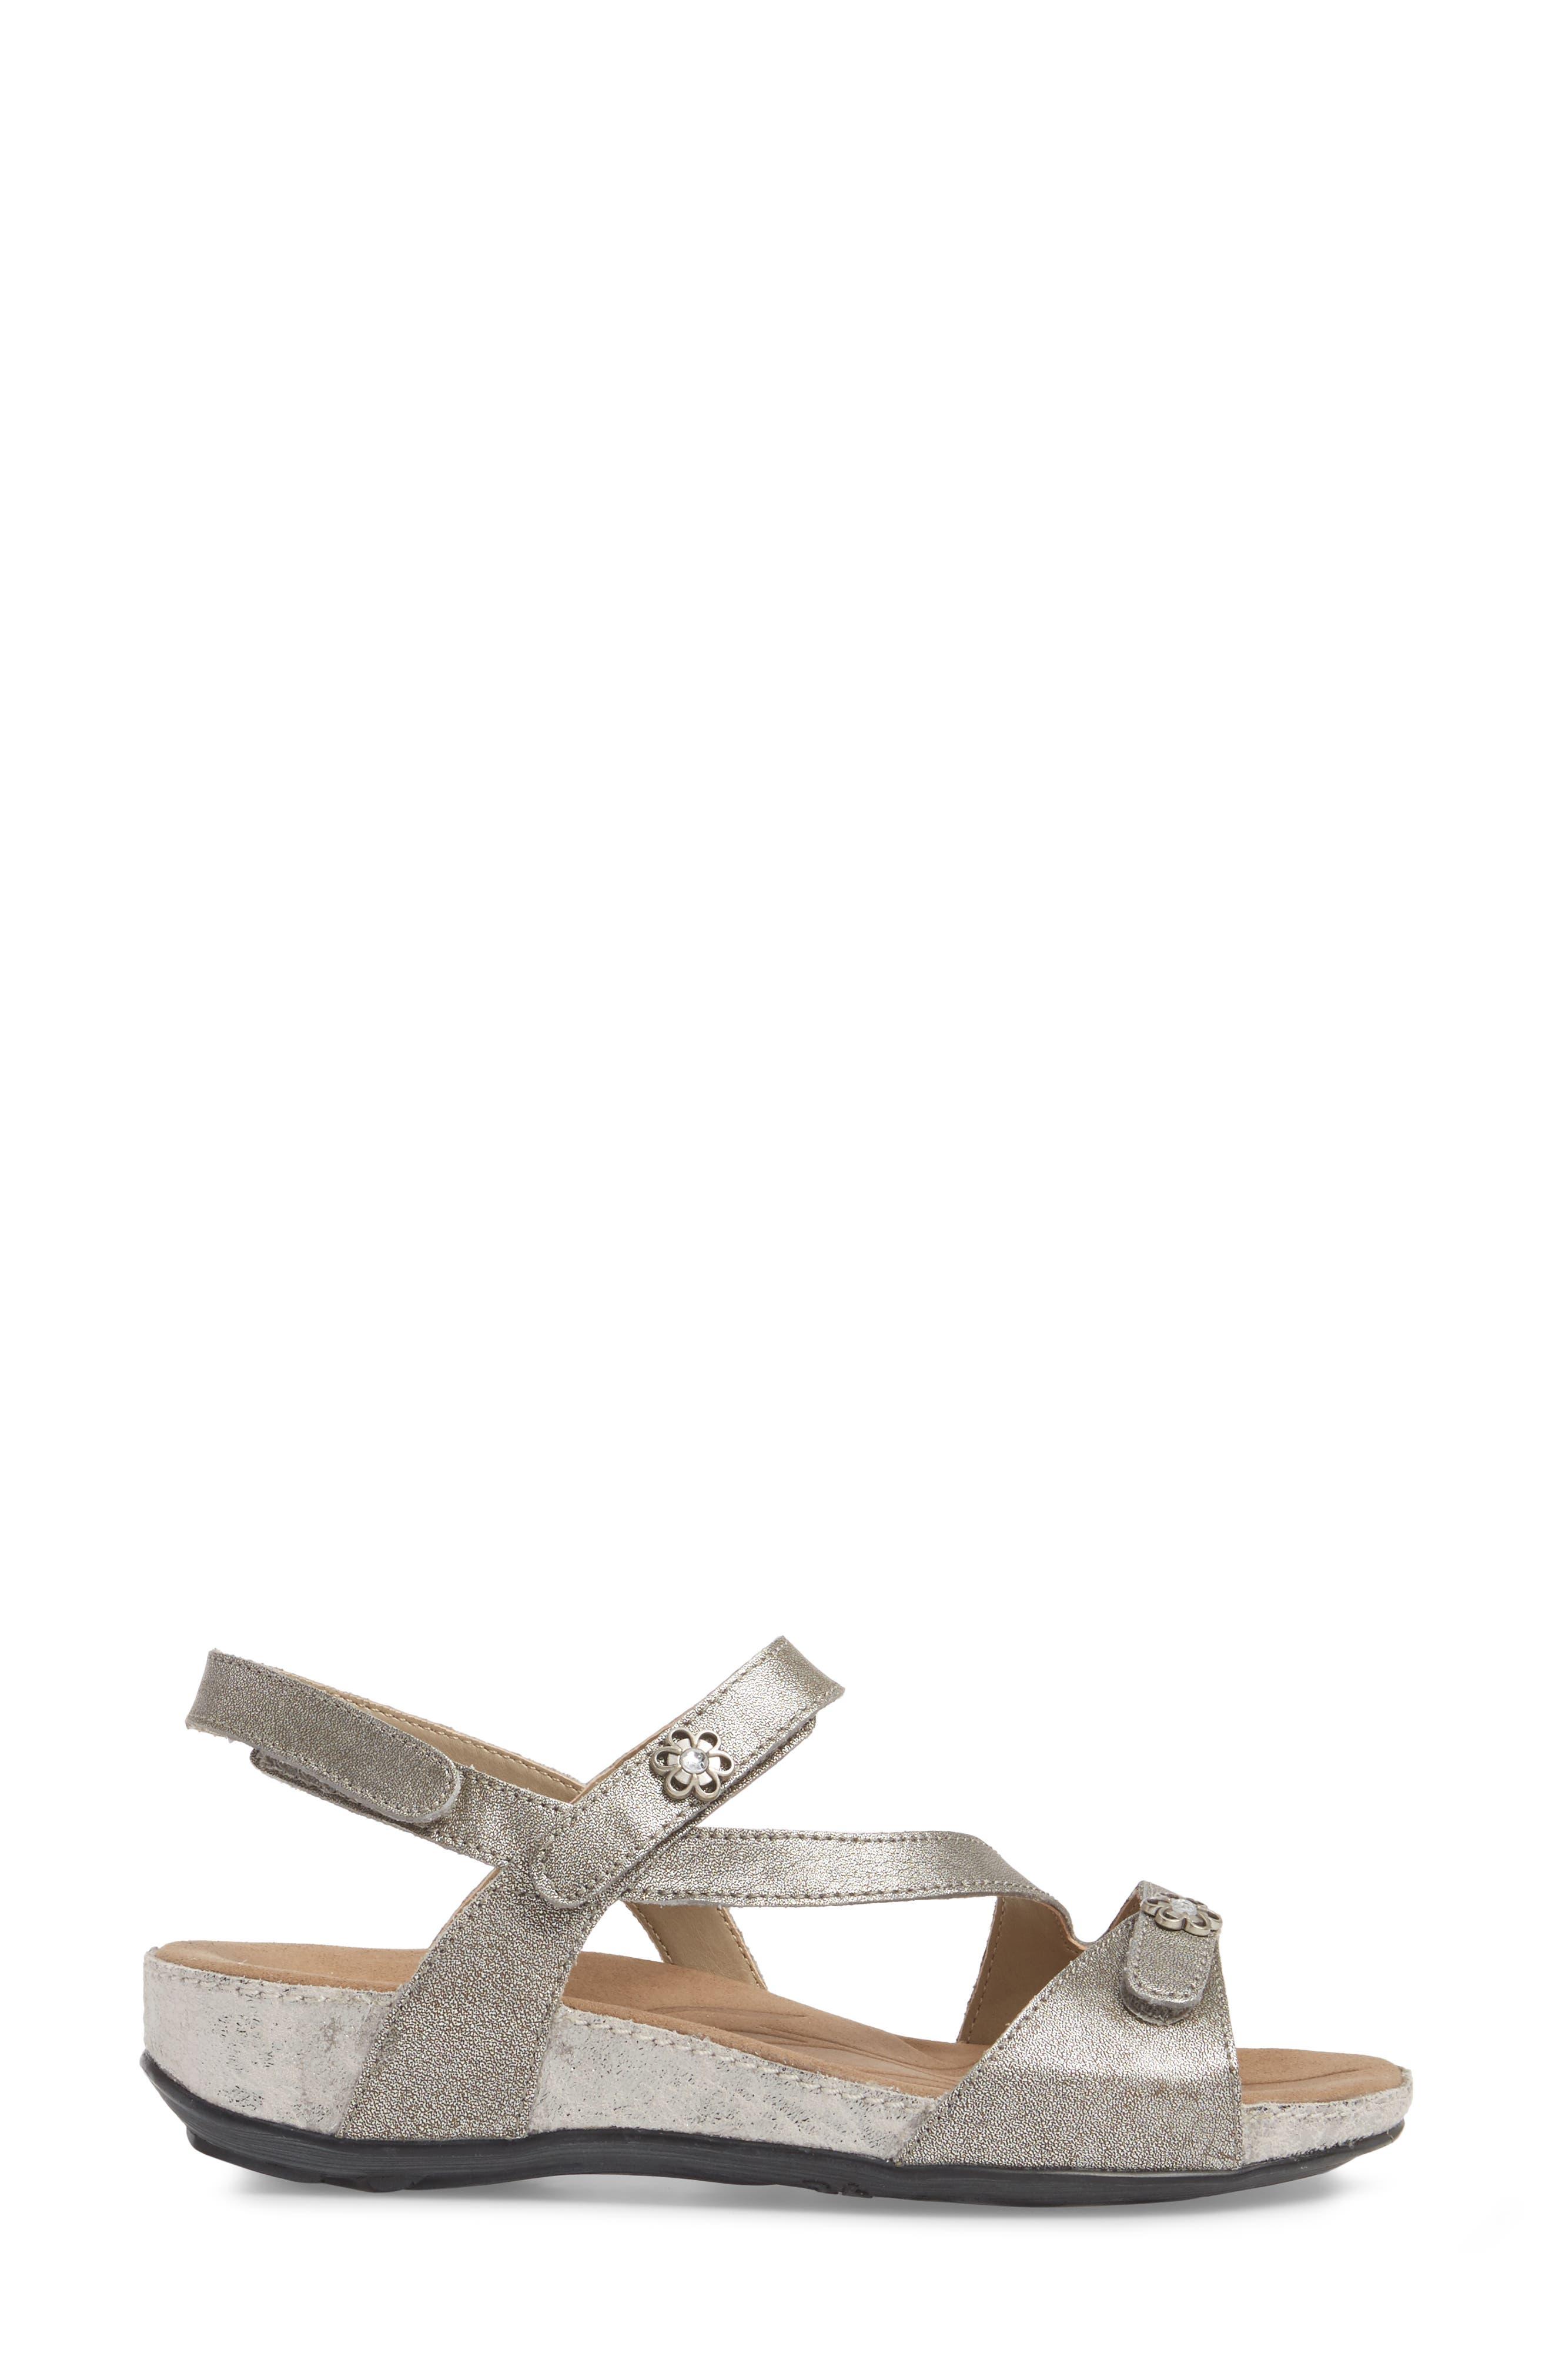 Fidschi 54 Sandal,                             Alternate thumbnail 3, color,                             PLATINUM LEATHER